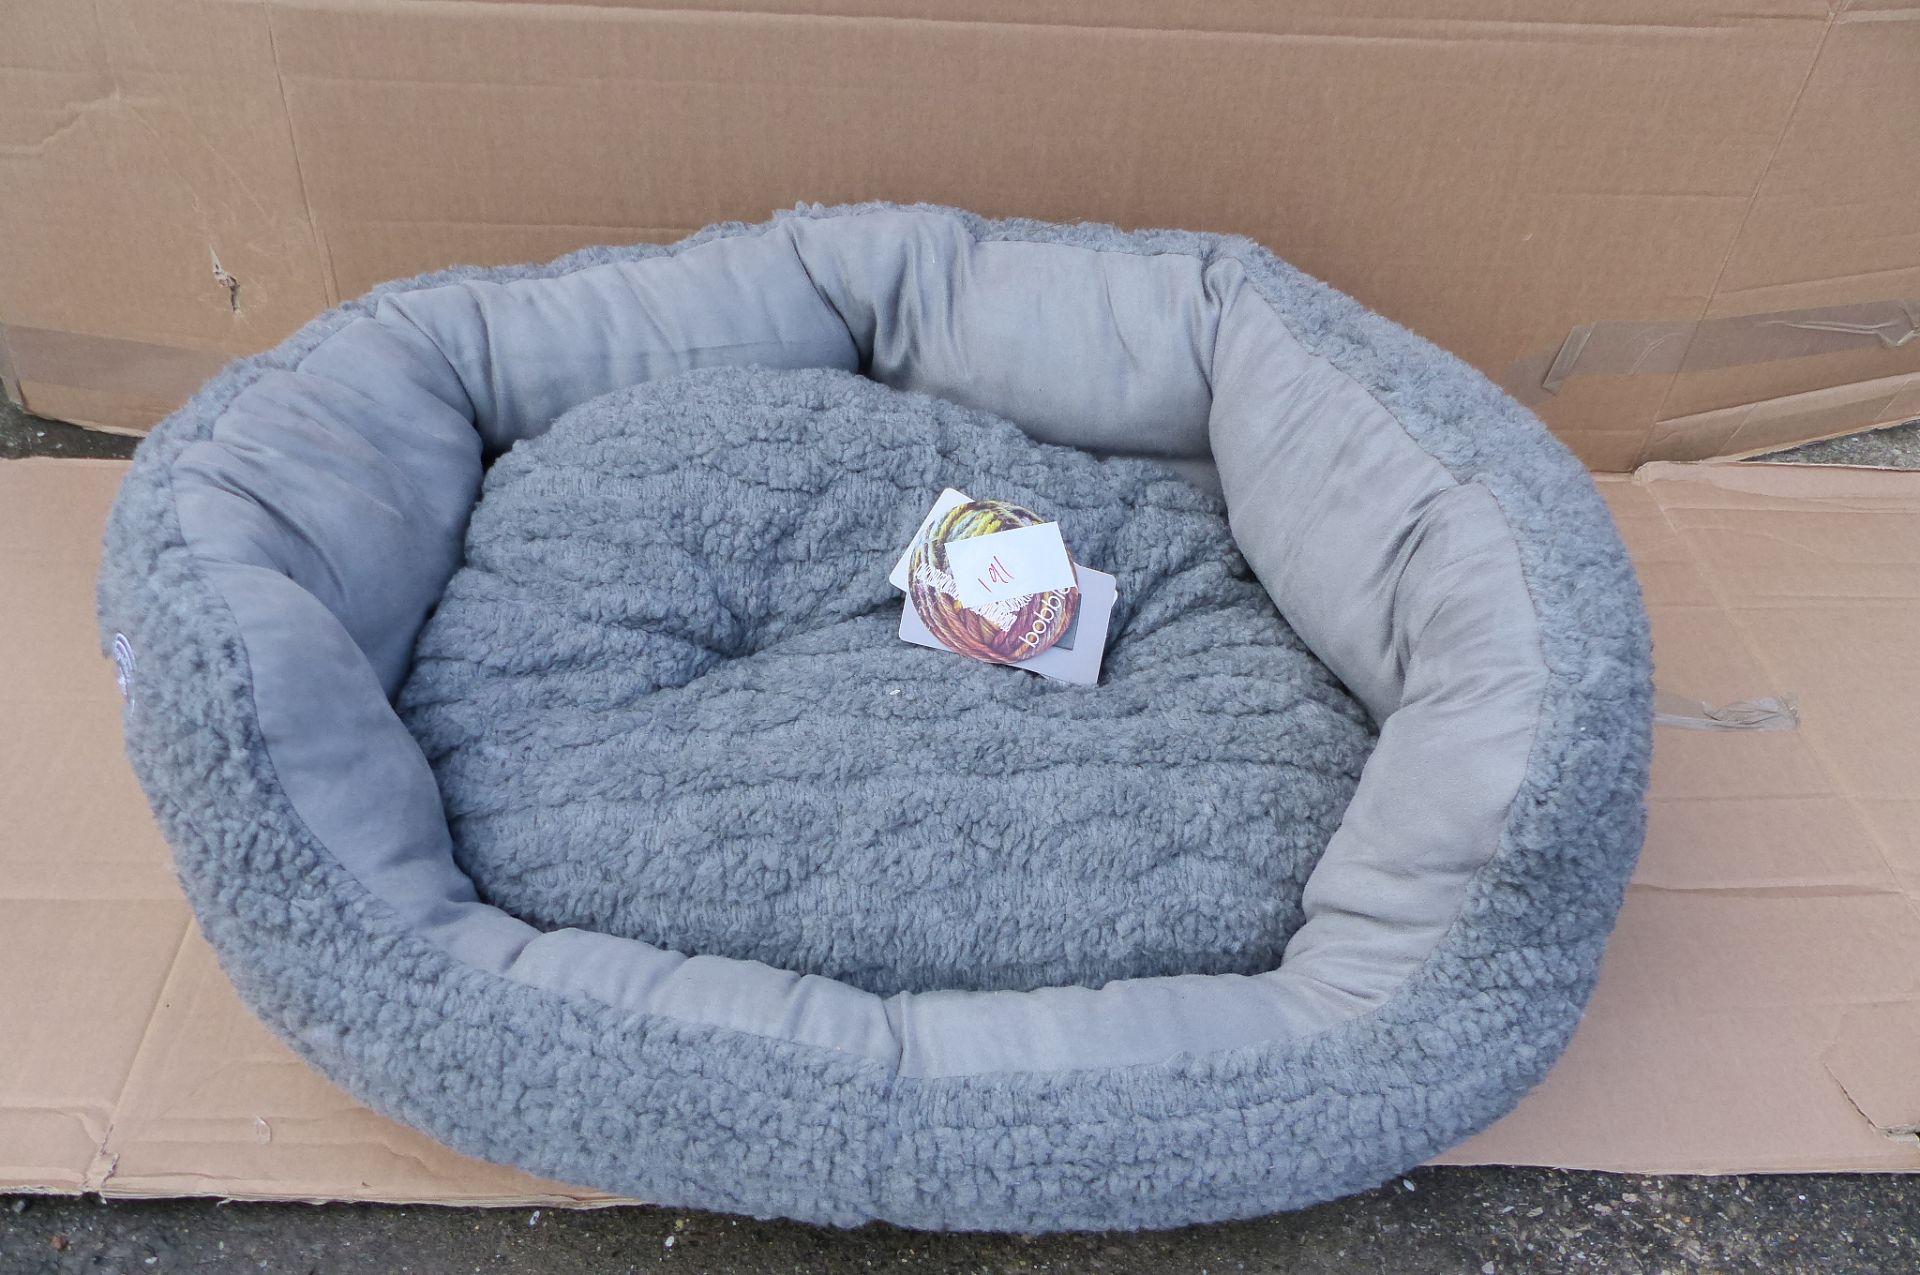 Danish Designs lux slumber dog bed 30 inch SKU191